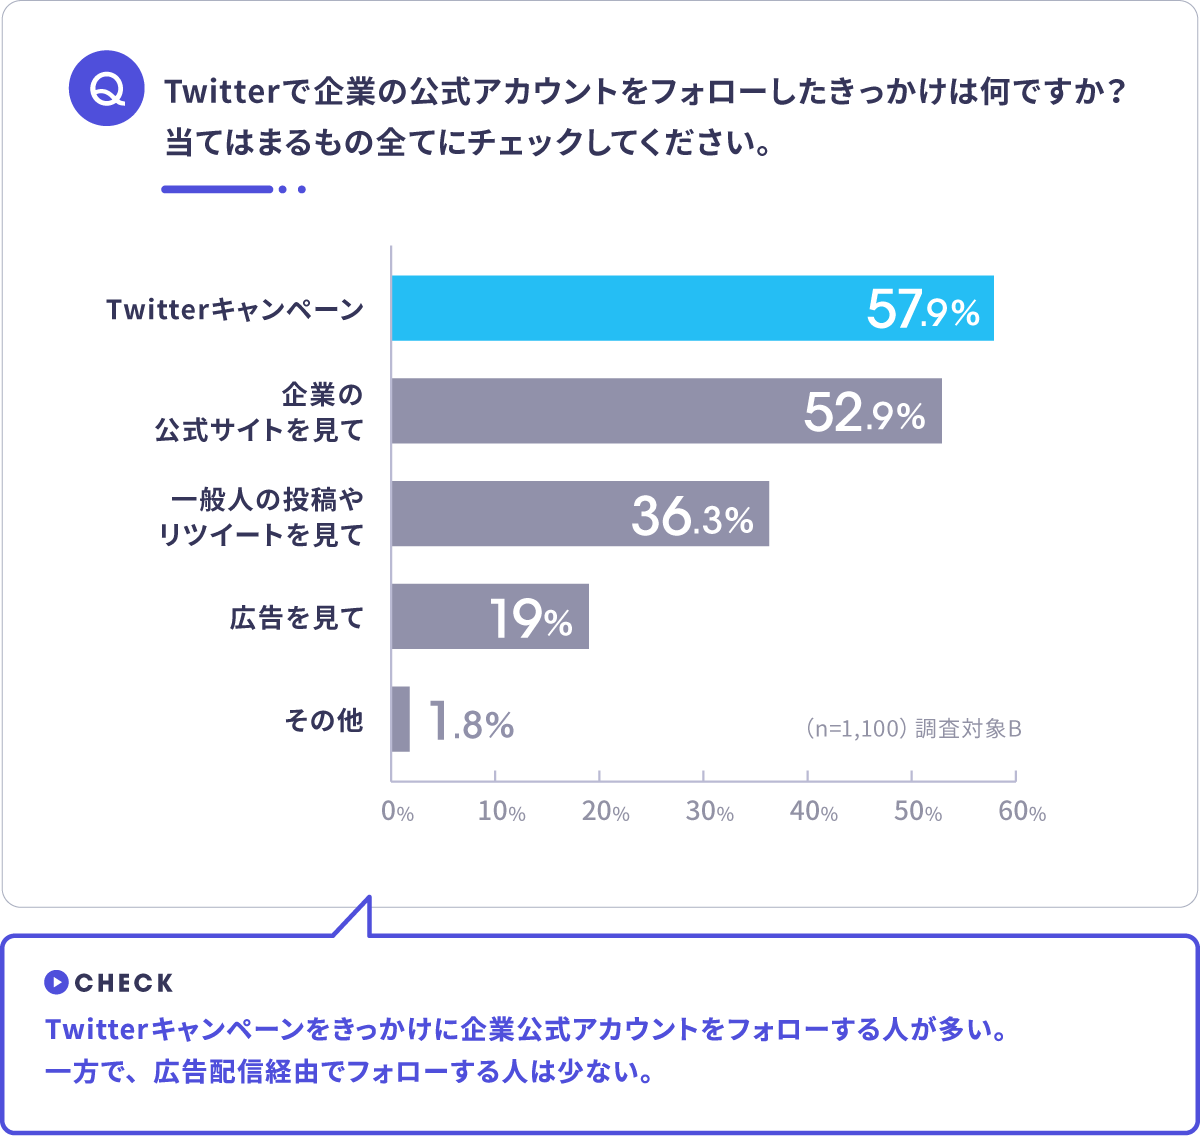 Twitter利用実態調査 公式アカウント フォローきっかけ